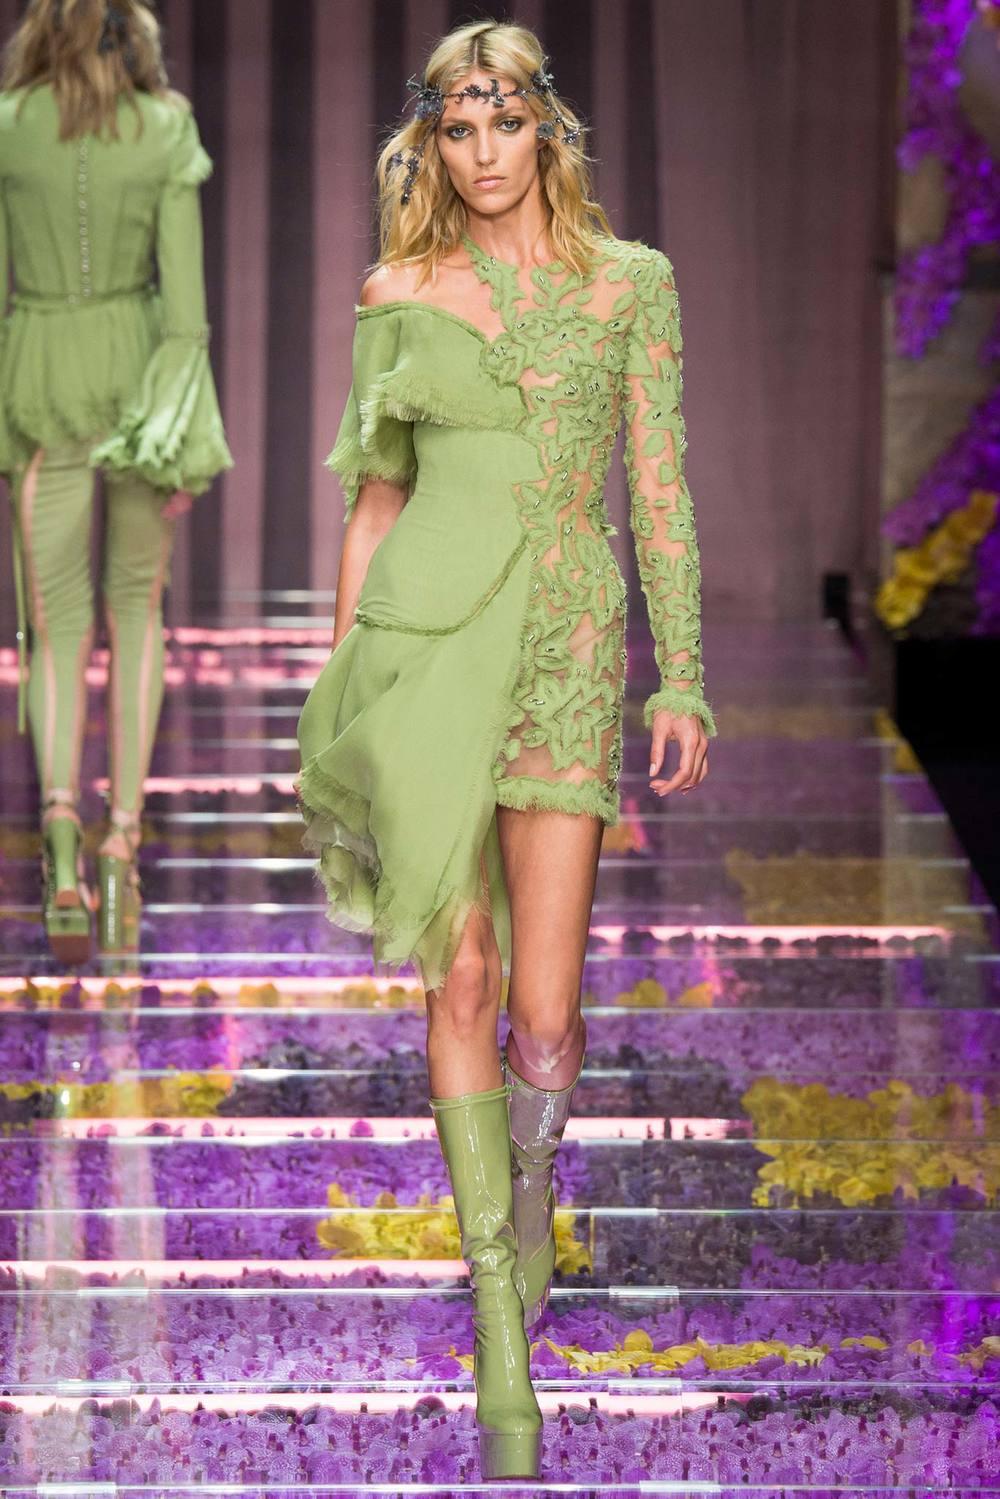 Designer: Atelier Versace, Photo Credit: Style.com